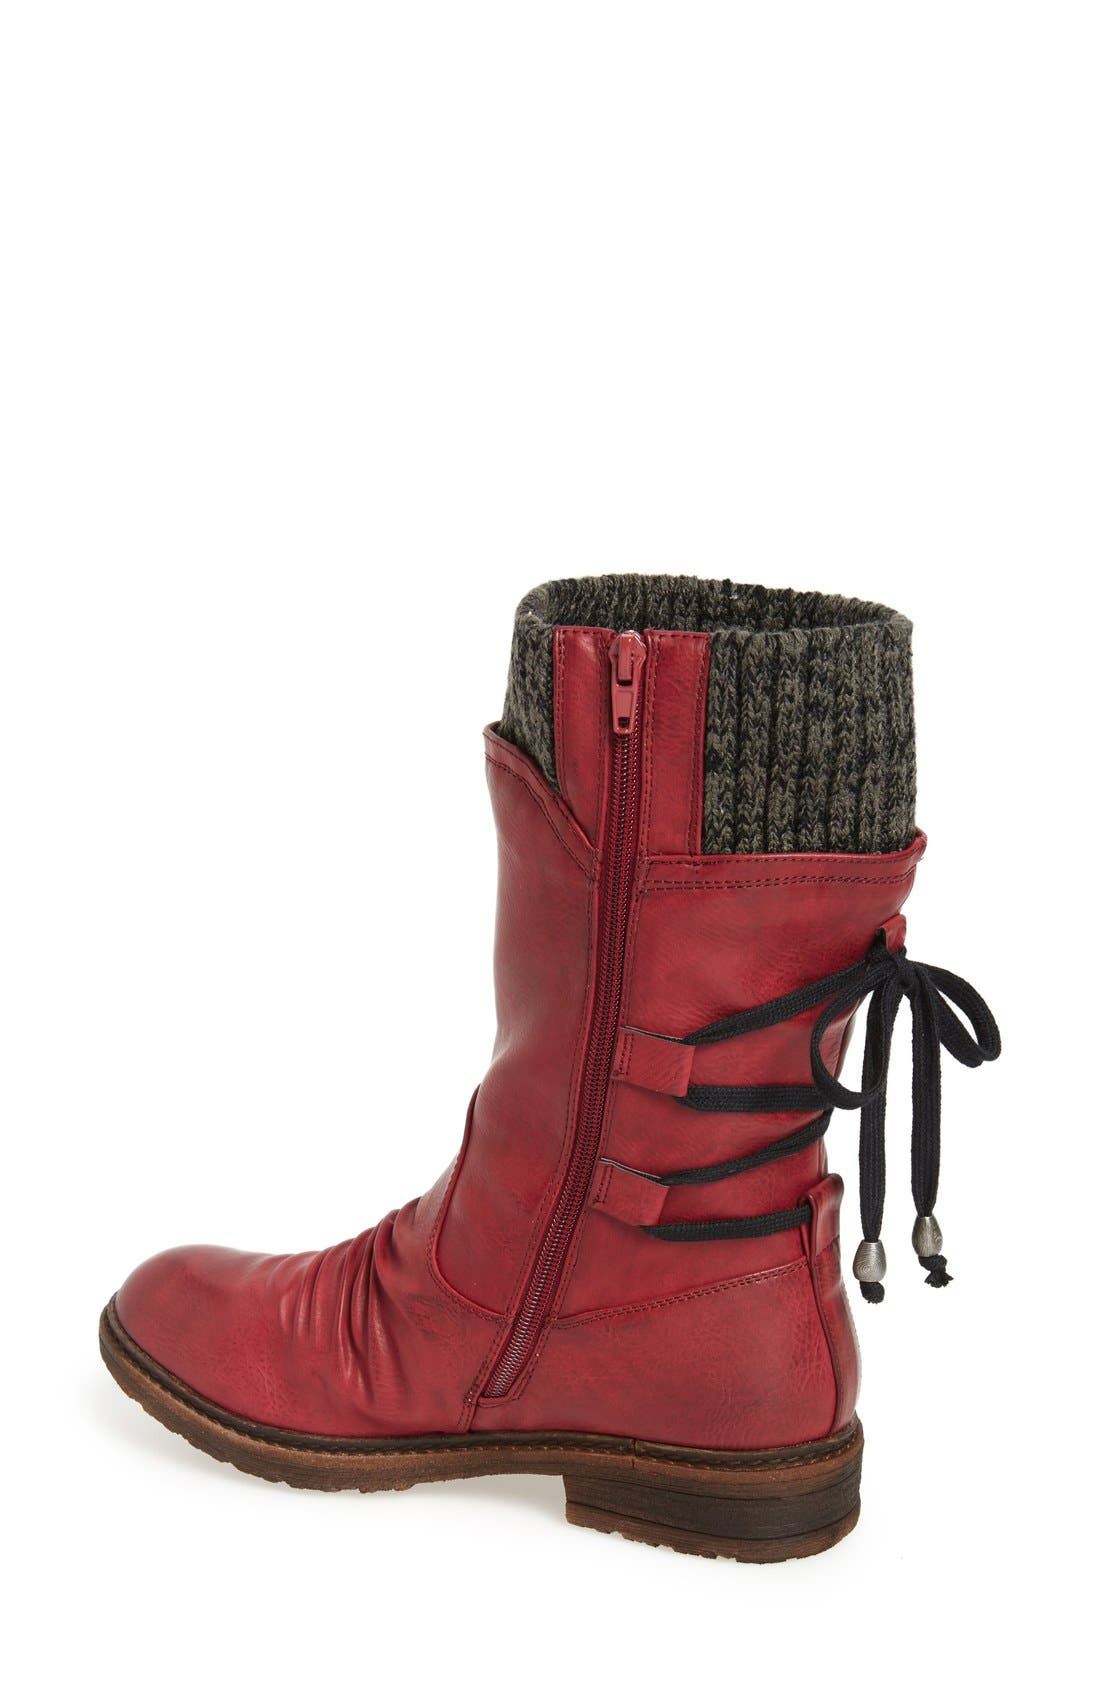 Dominika 73 Water Resistant Boot,                             Alternate thumbnail 2, color,                             Burgundy/ Black